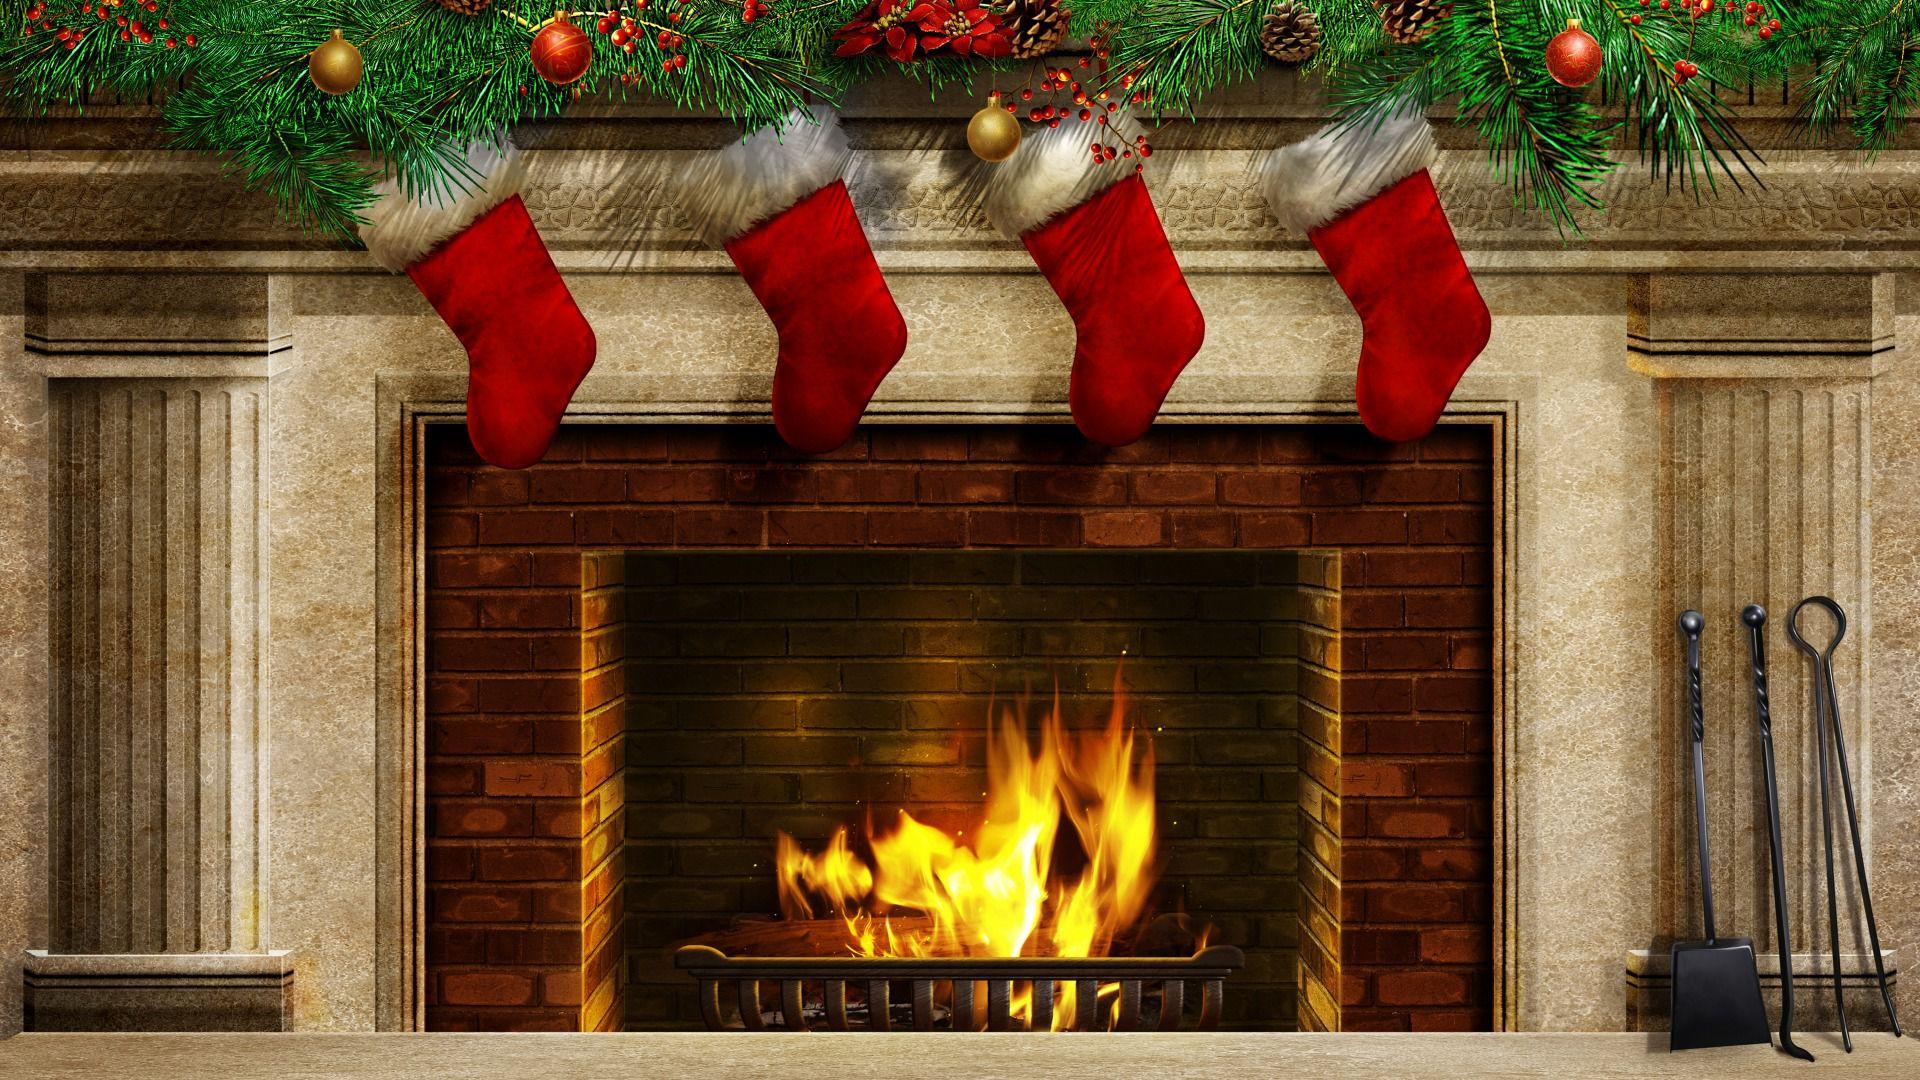 christmas fireplace wallpaper